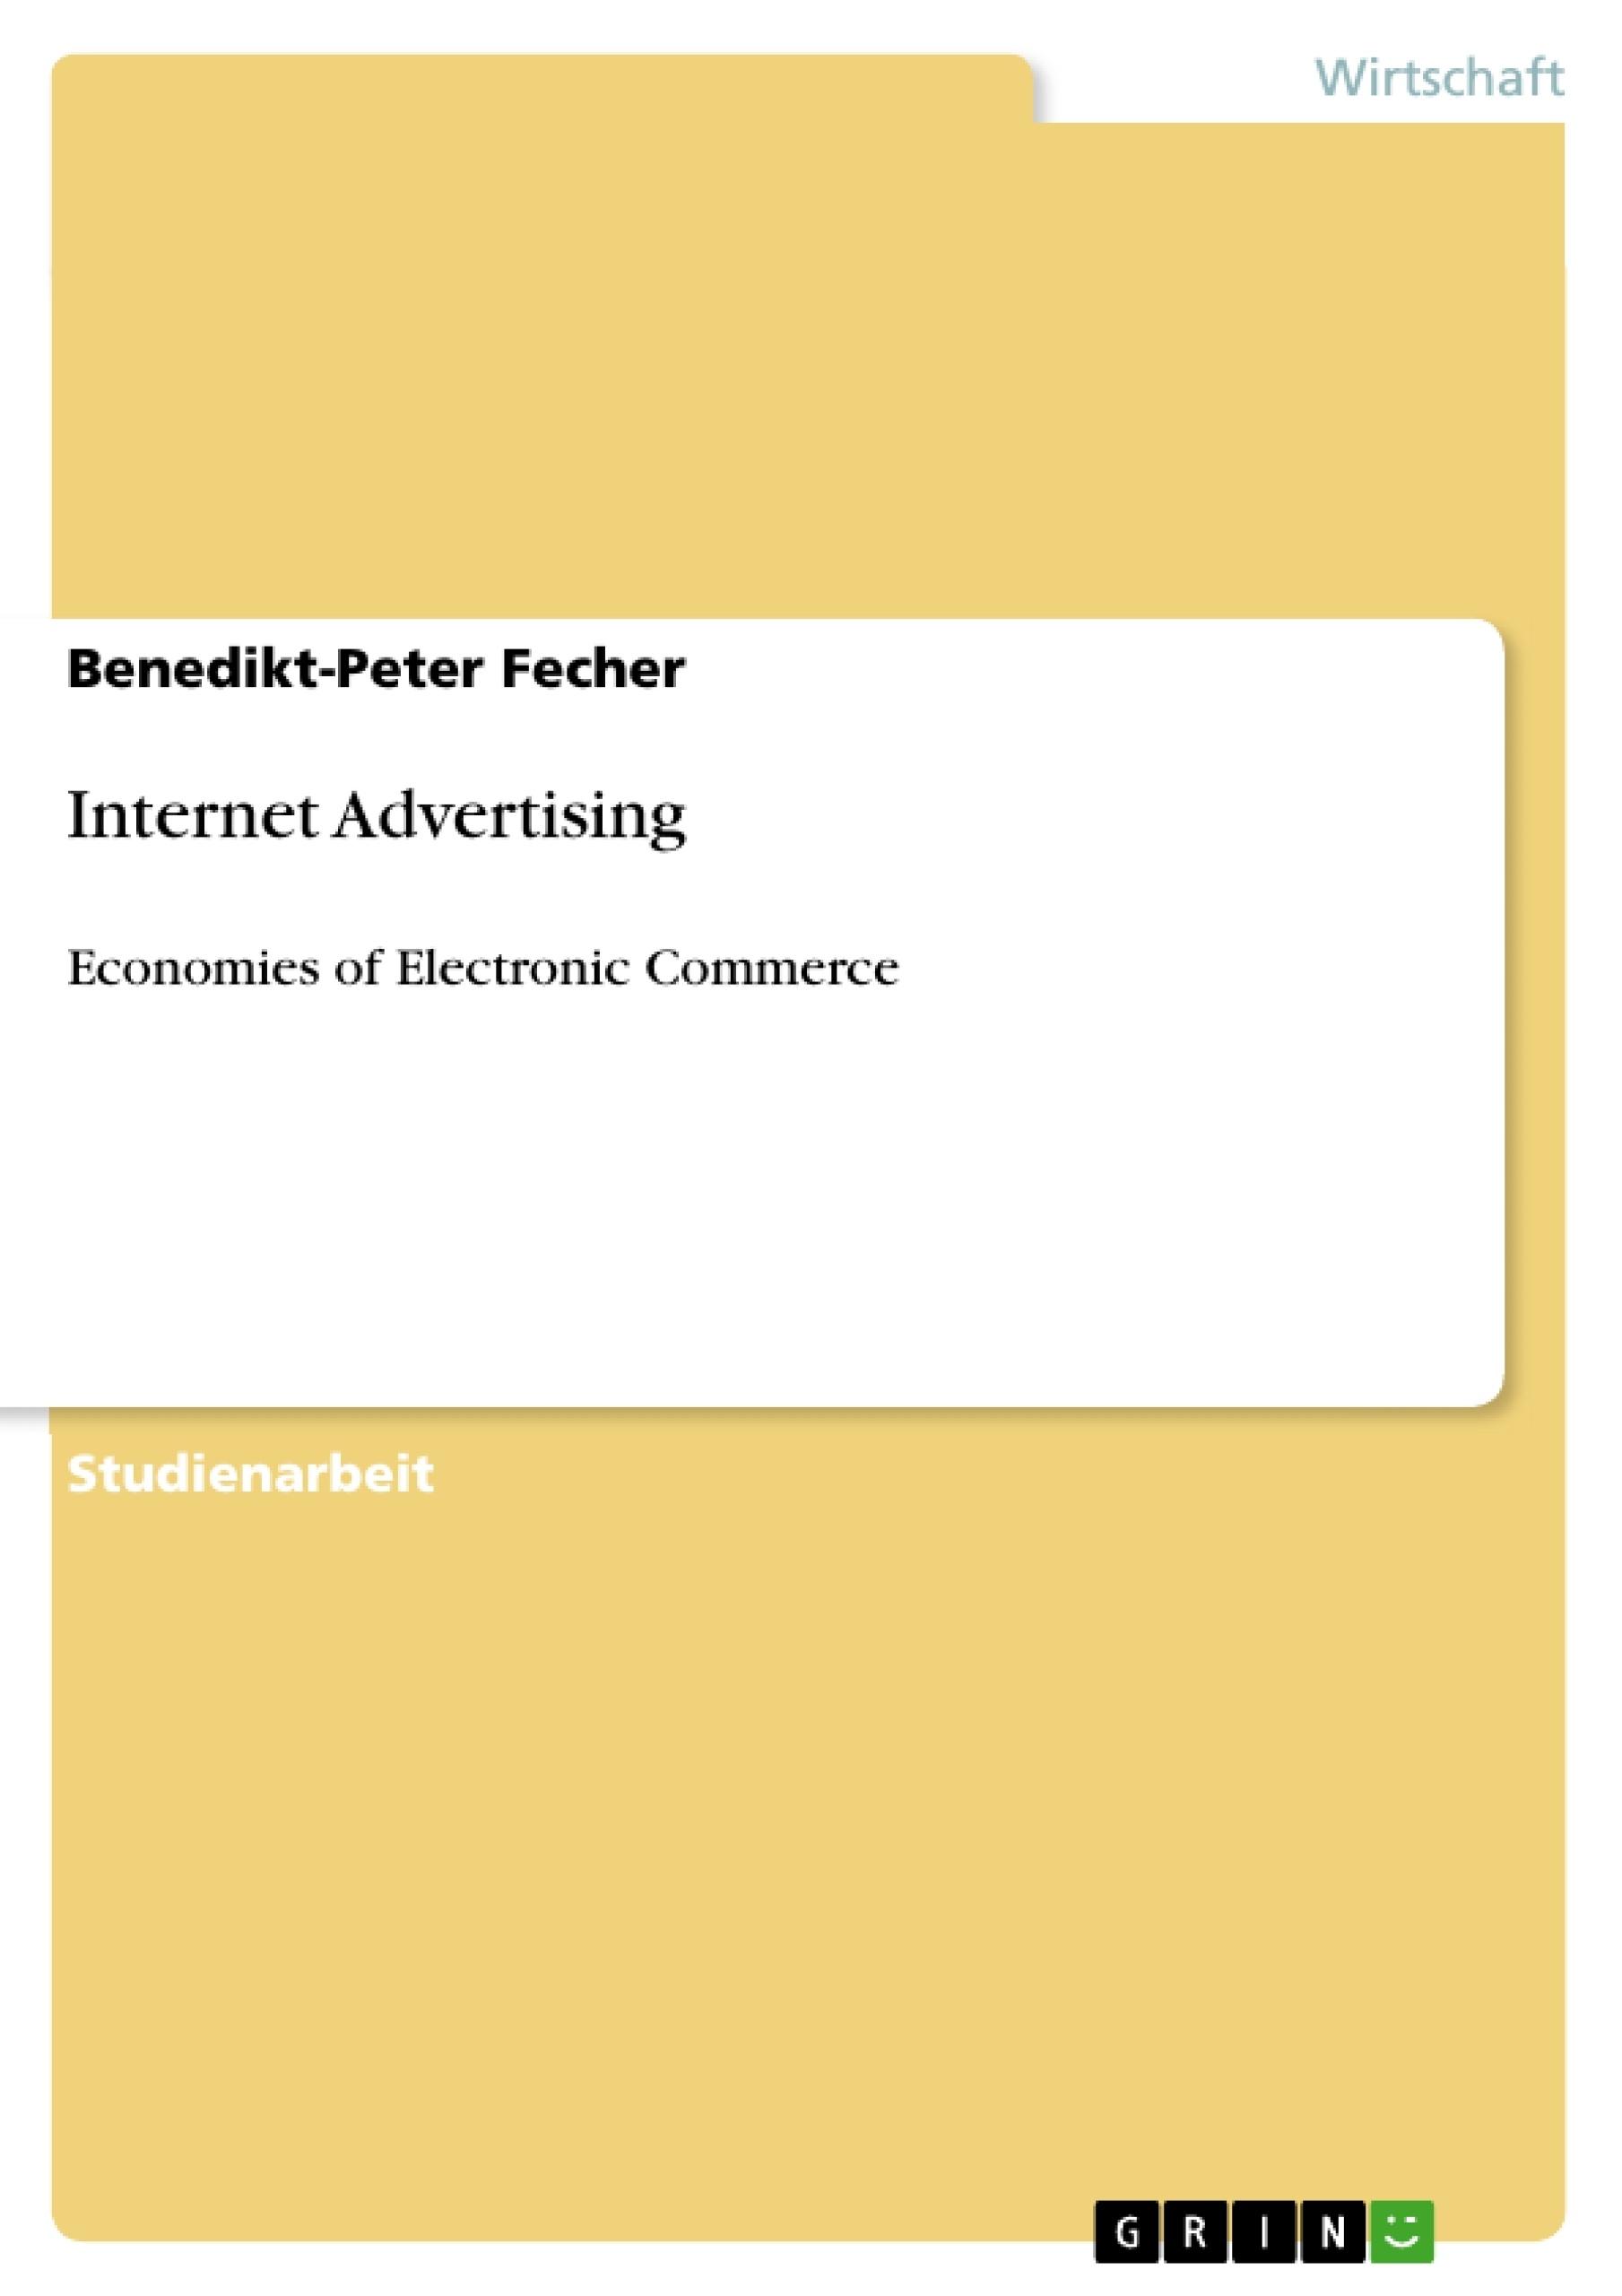 Titel: Internet Advertising